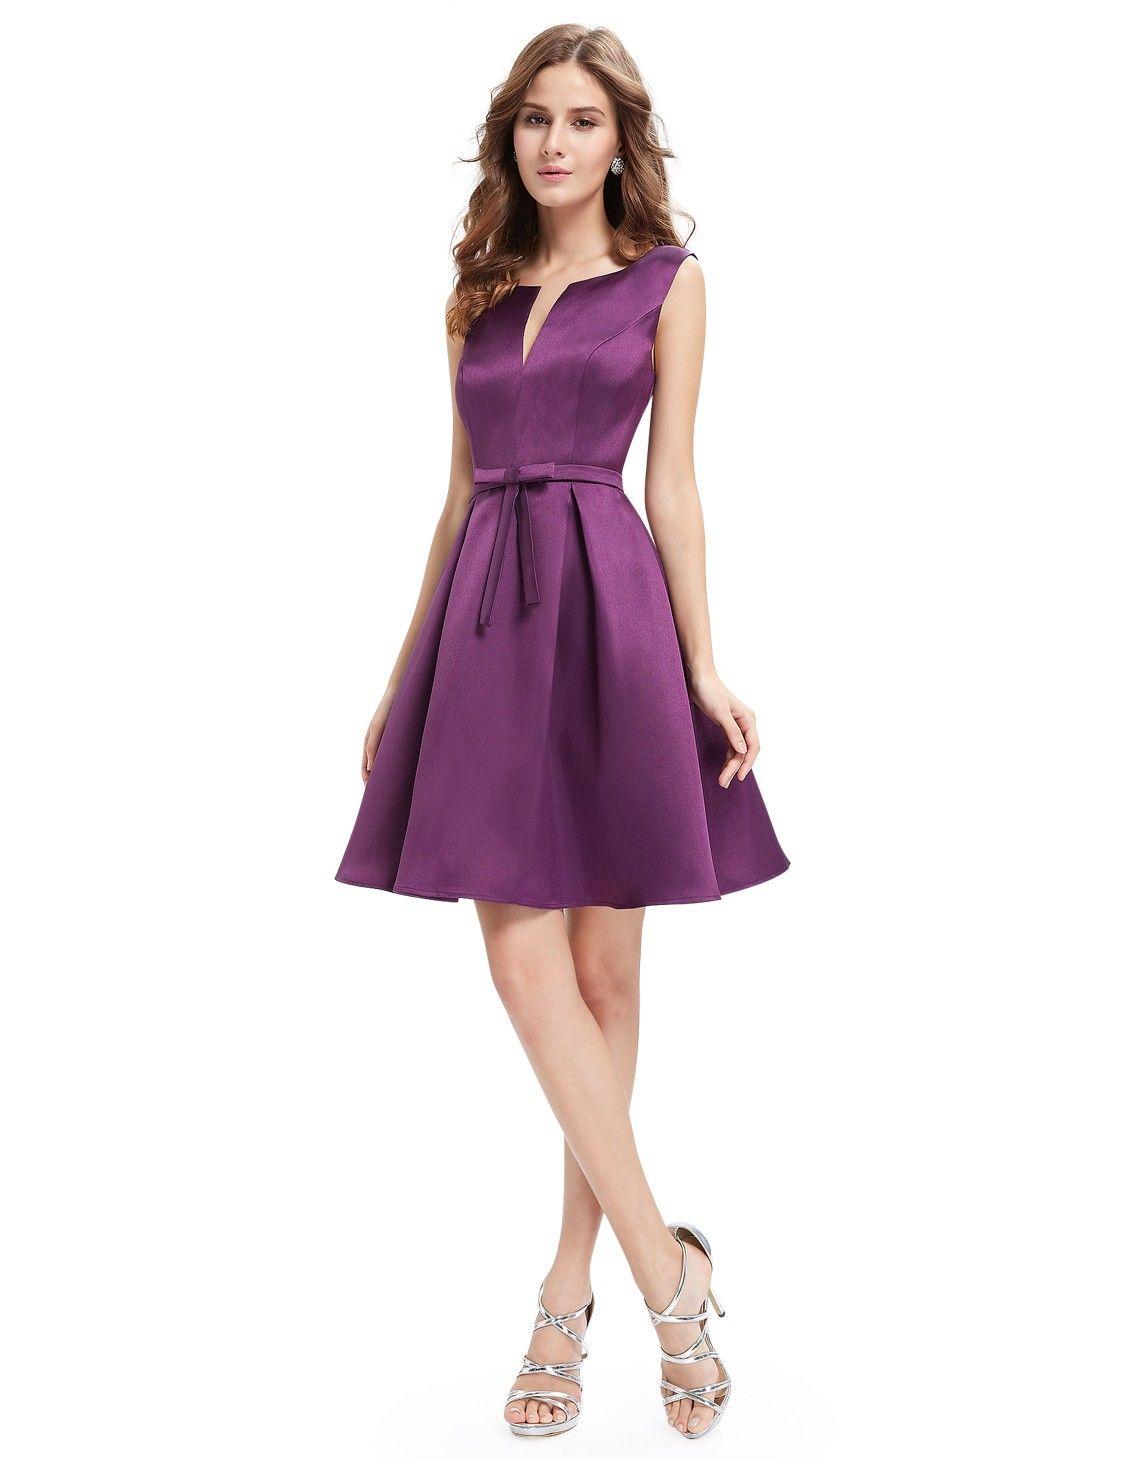 Women\'s Elegant Sleeveless Short Party Cocktail Party Dress